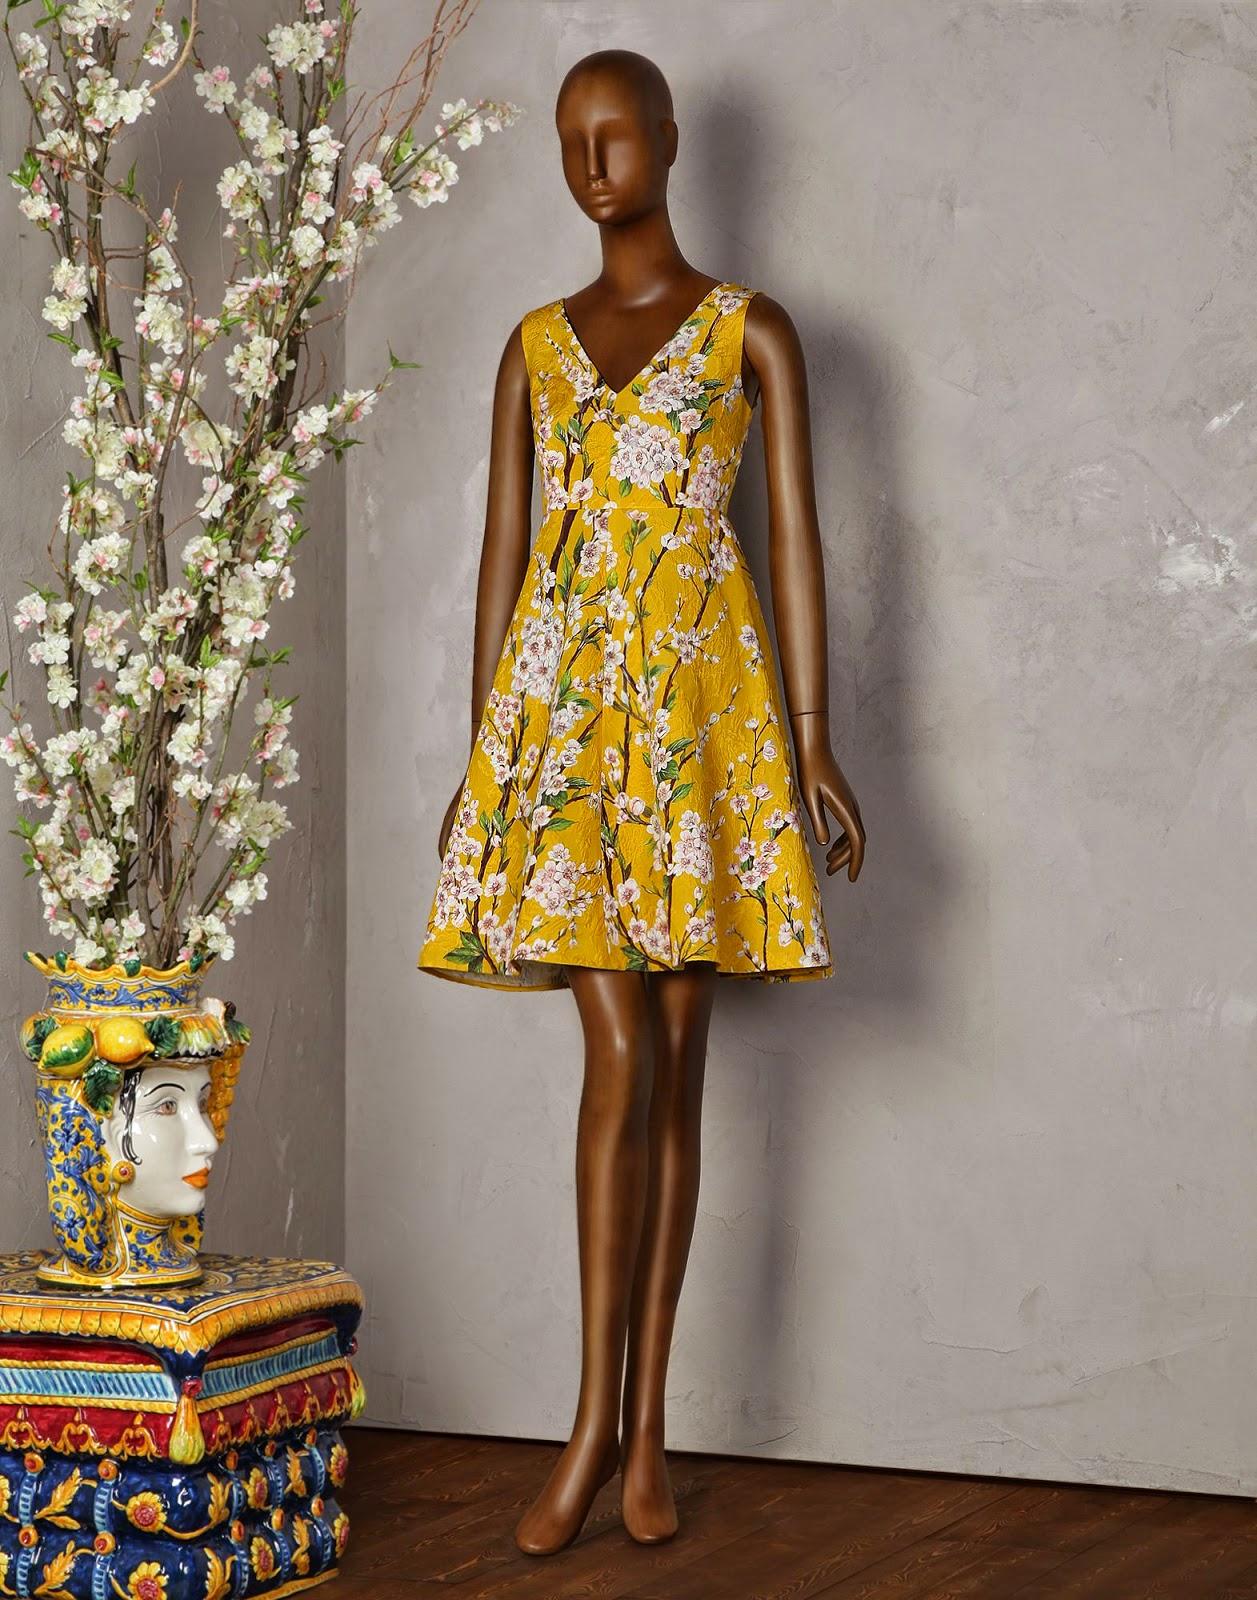 http://store.dolcegabbana.com/it/dolce-gabbana/vestiti-corti_cod34417460hi.html